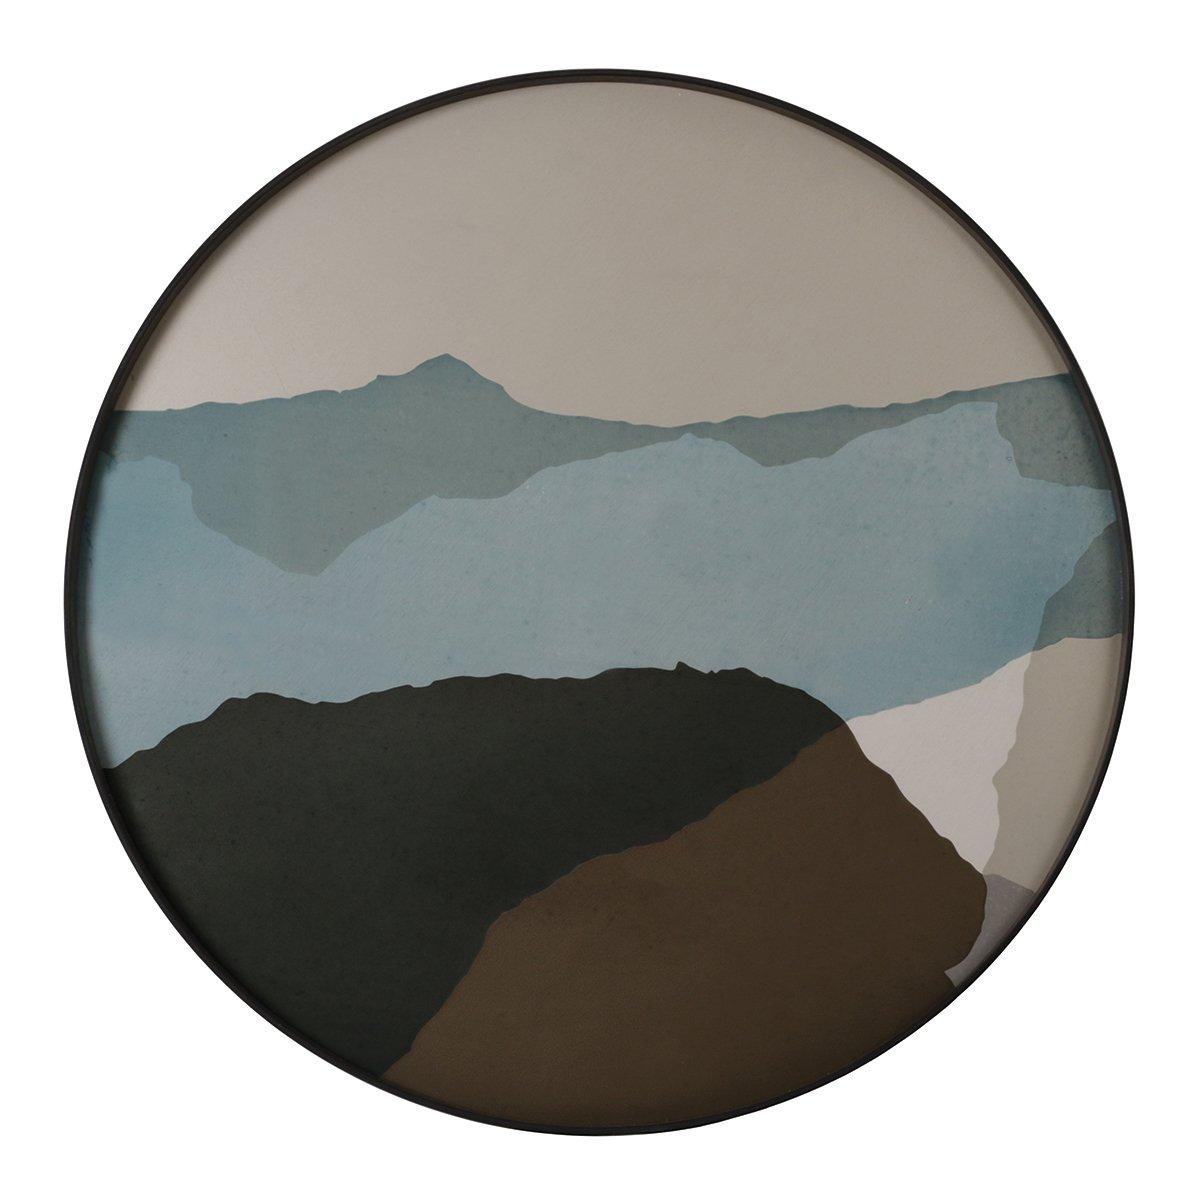 Ethnicraft Wabi Sabi Dienblad Rond Extra Large �92 x h. 4 cm